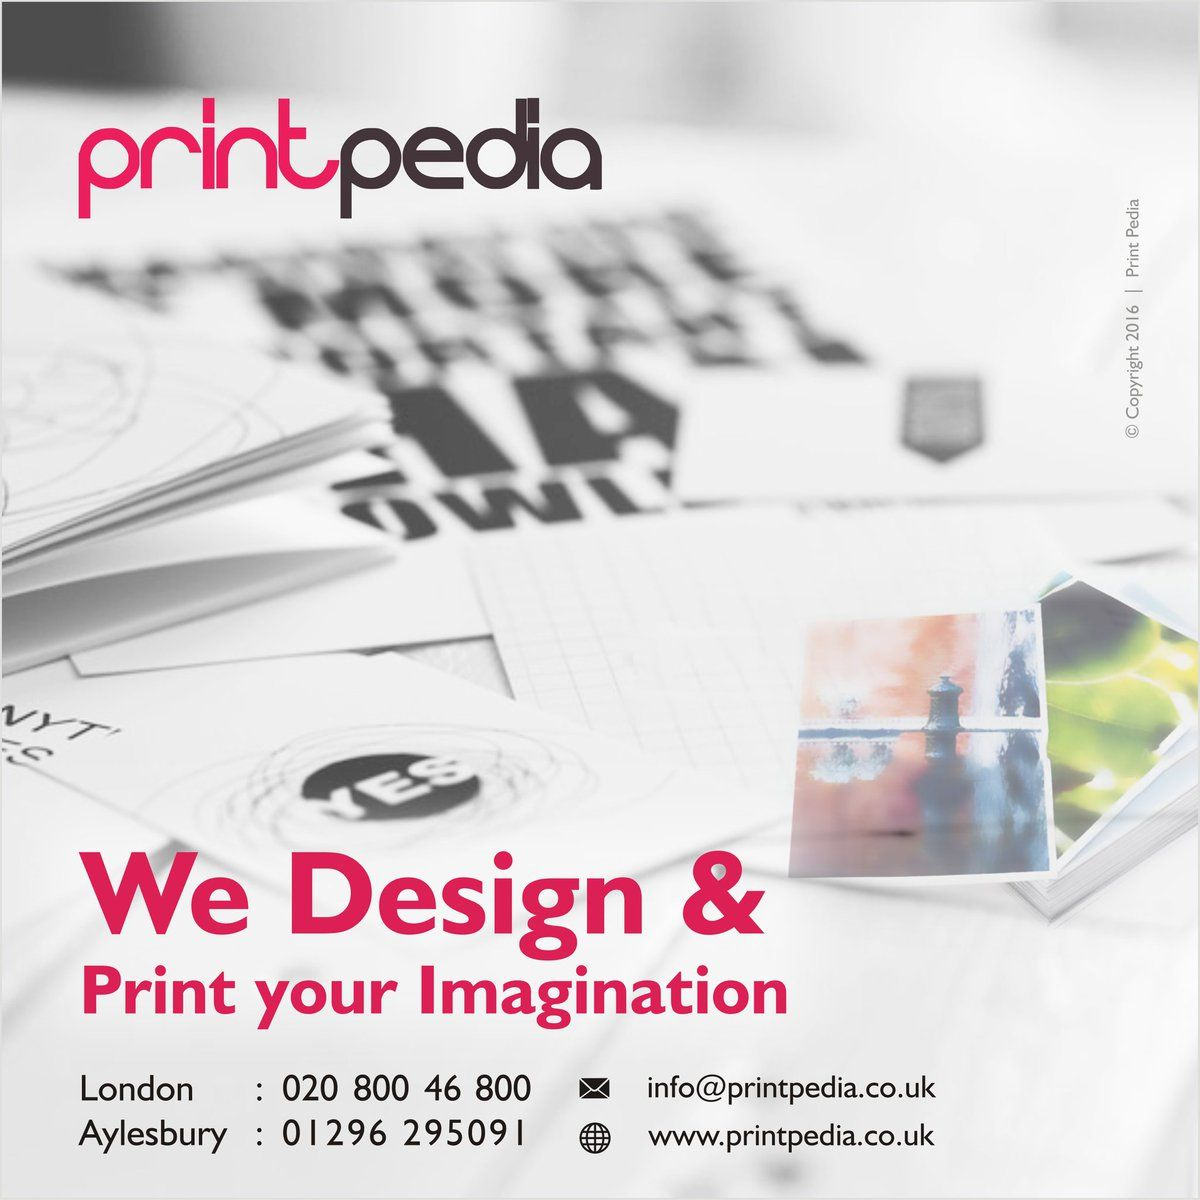 We Design & Print your Imagination. Call us on Aylesbury: 01296 295091  Find more information: http://printpedia.co.uk  #LogoDesignUK   #GraphicDesignUK   #PrintingUK   #London   #Aylesbury   #Bucks   #Brighton   #Kent   #Shoreditch   #Buckinghamshire